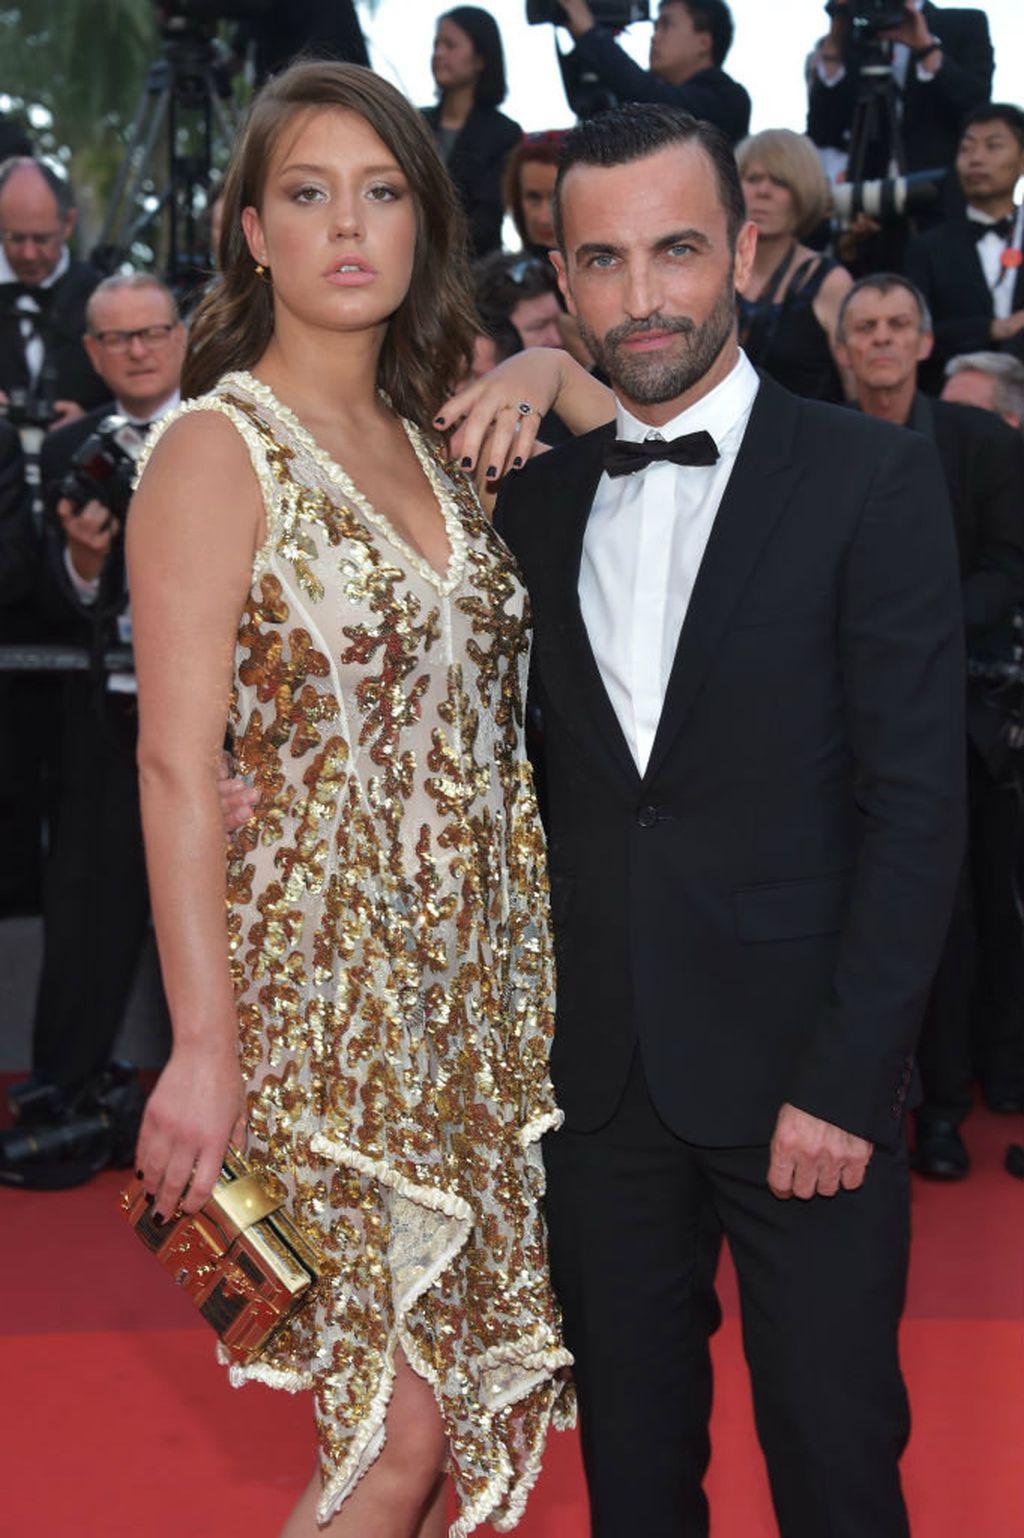 Glumica Adele Exarchopoulos sa svojom Petite Malle torbom u društvu Nicolasa Ghesquierea